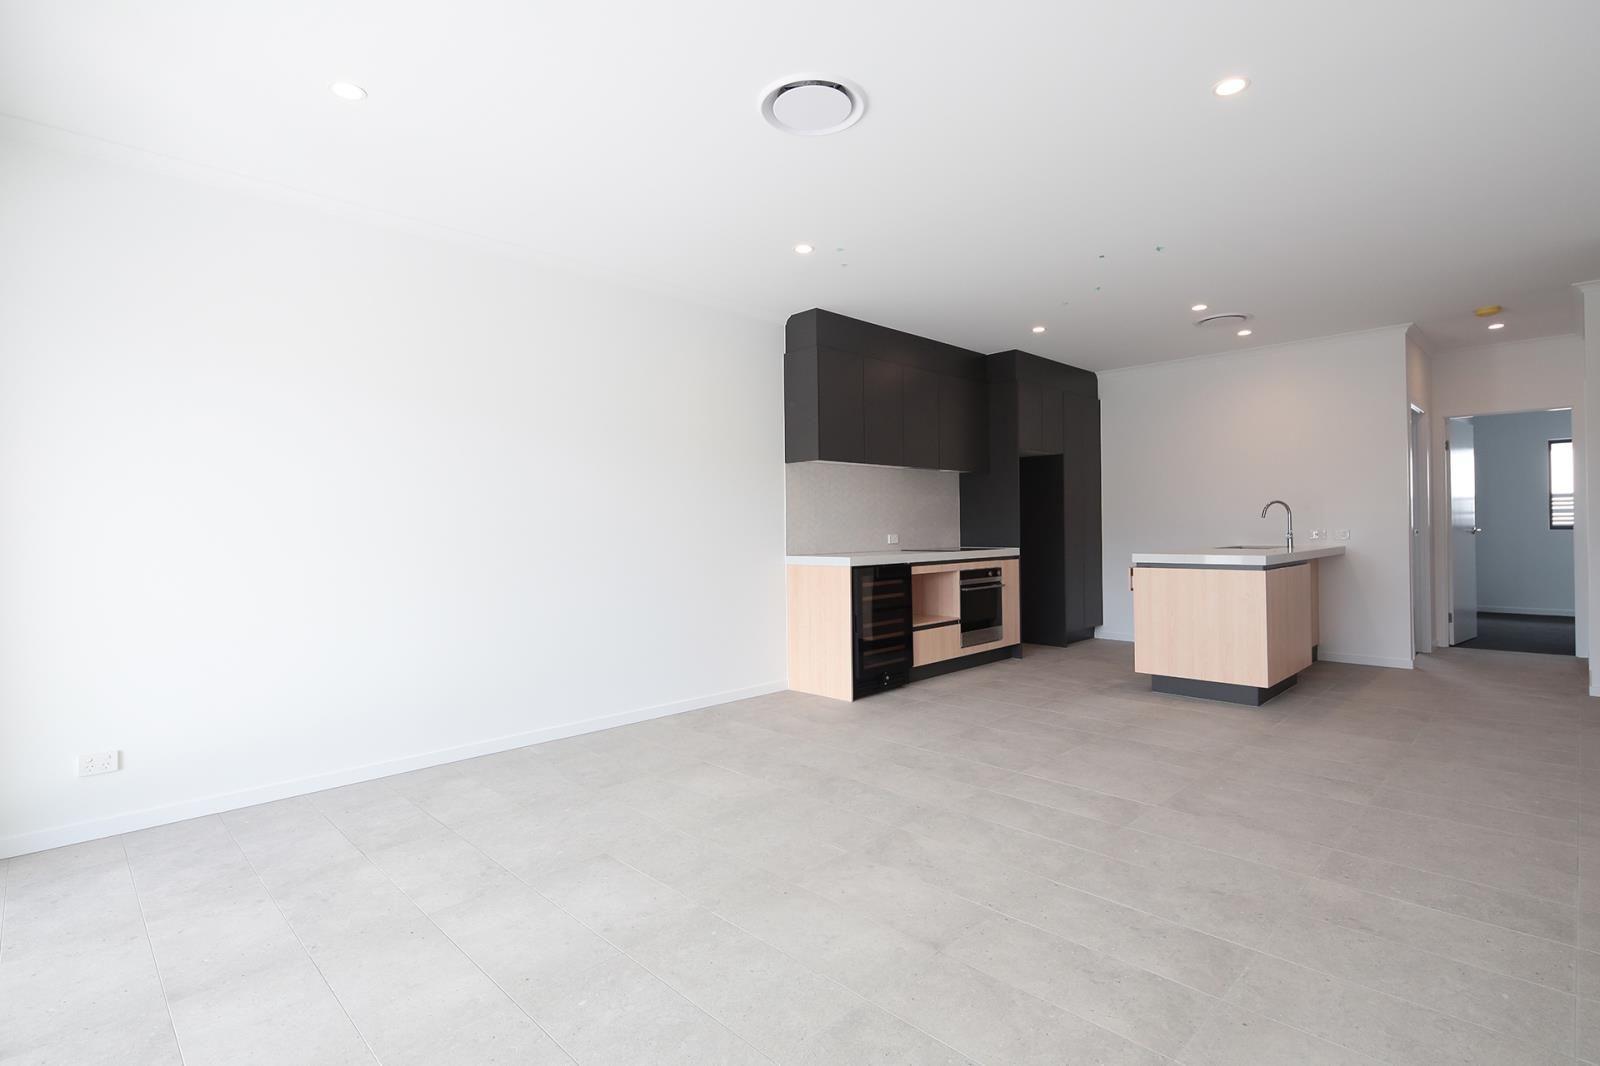 17/100 Monmouth Street, Morningside QLD 4170, Image 1